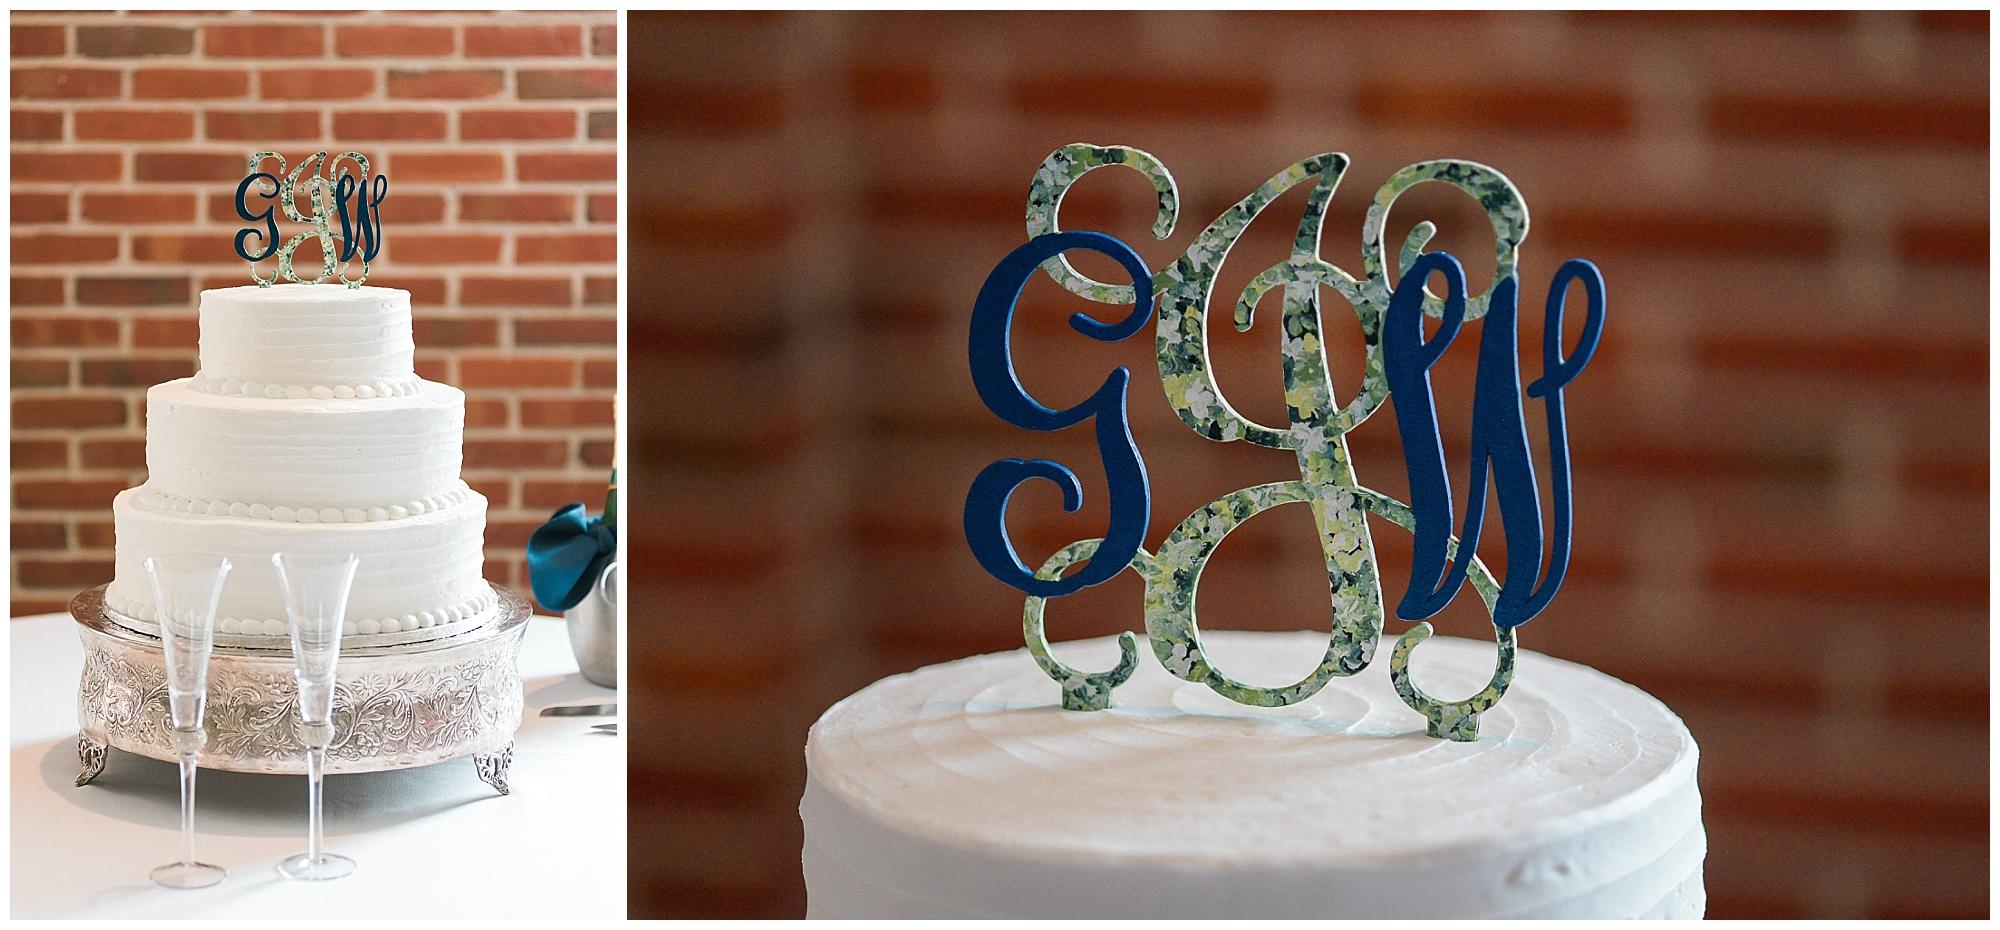 donut-days-wedding-cake